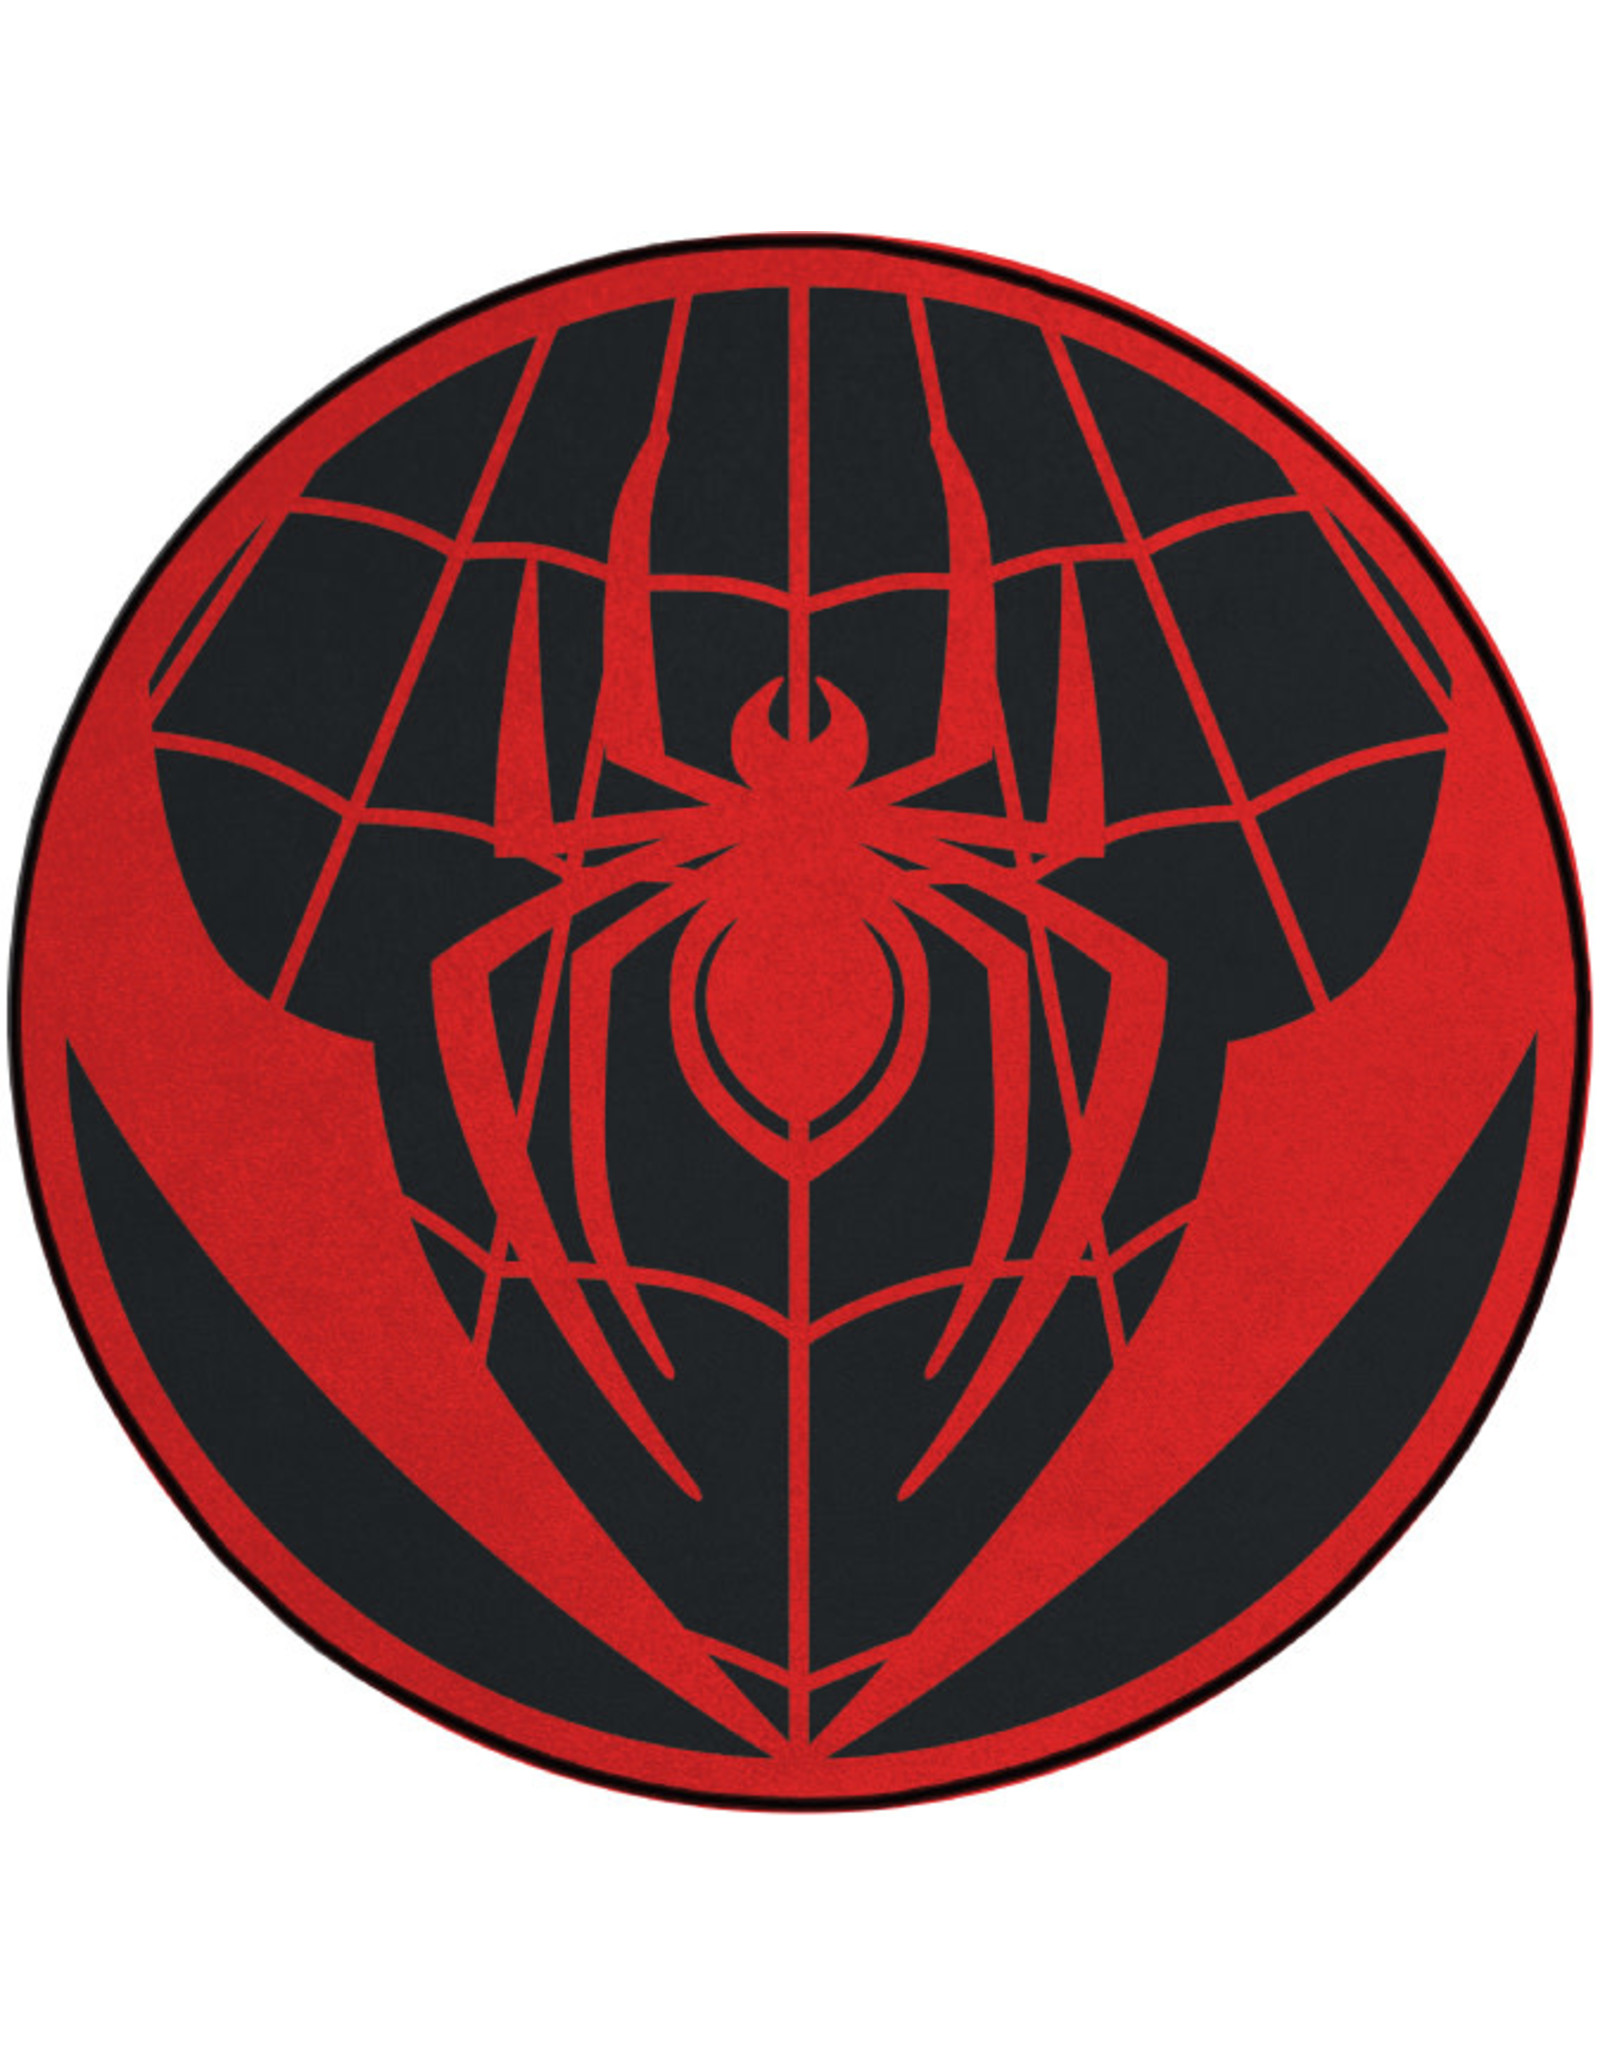 SPIDER MAN - Microfiber mat - 80cm diameter - Red Spider